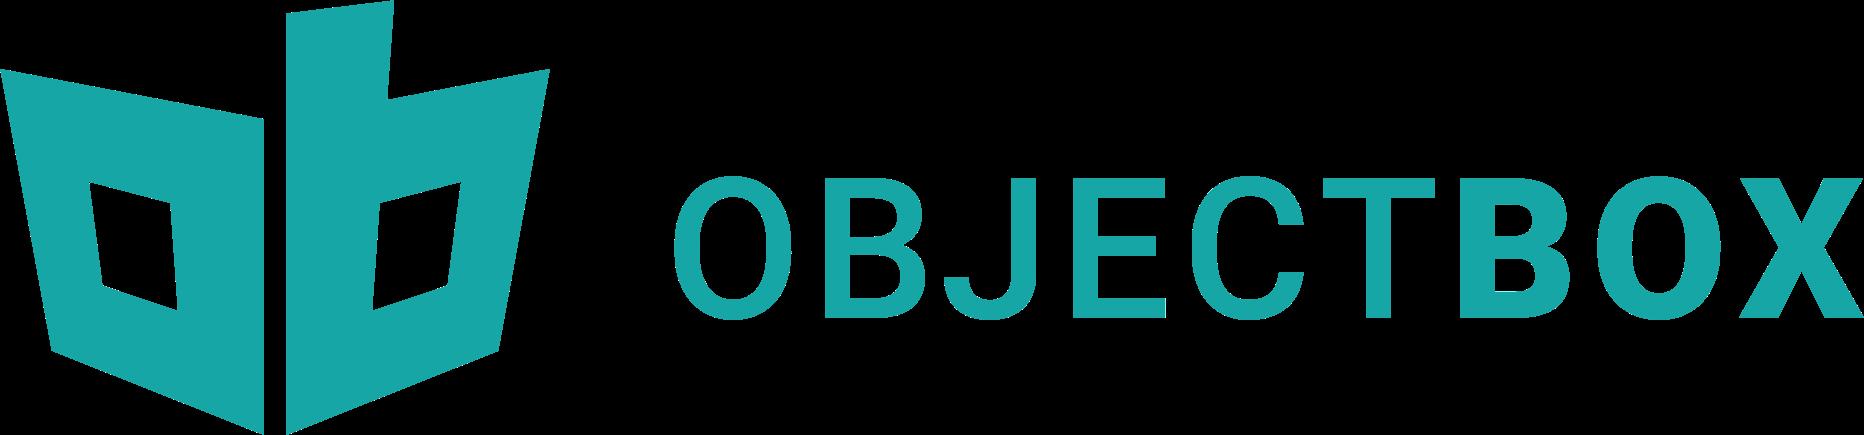 ObjectBox logo